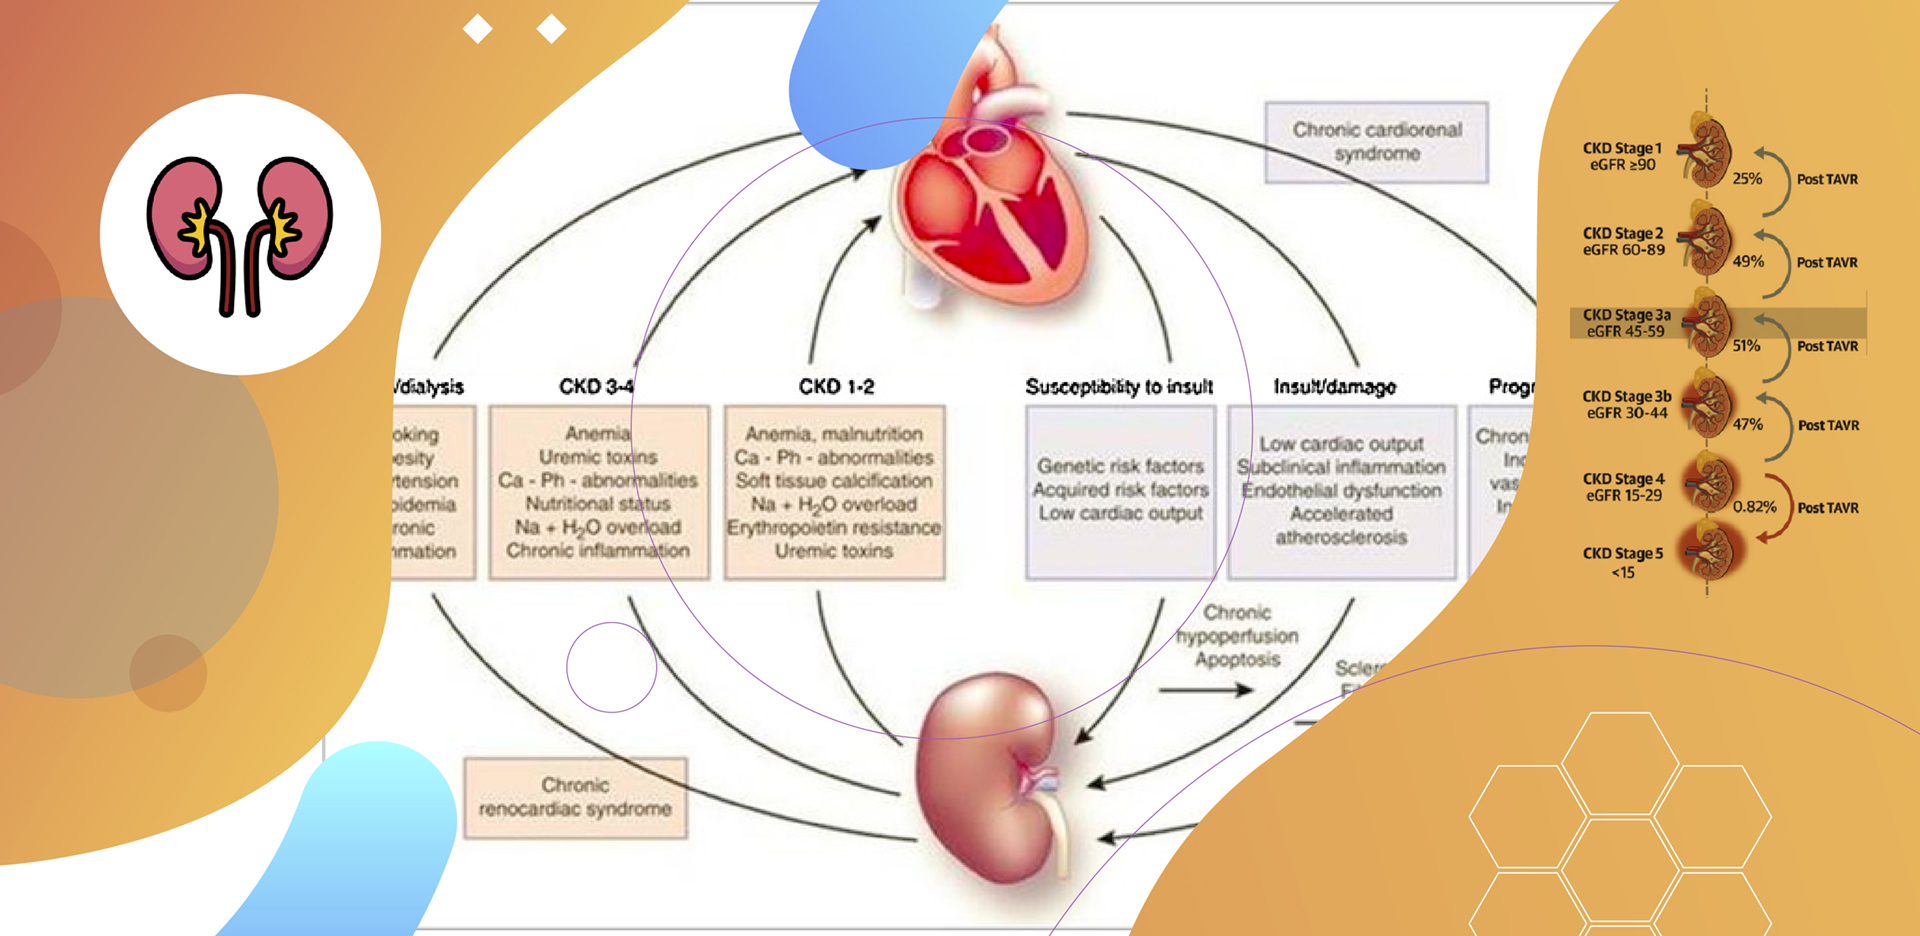 Doença Renal Crônica no TAVI